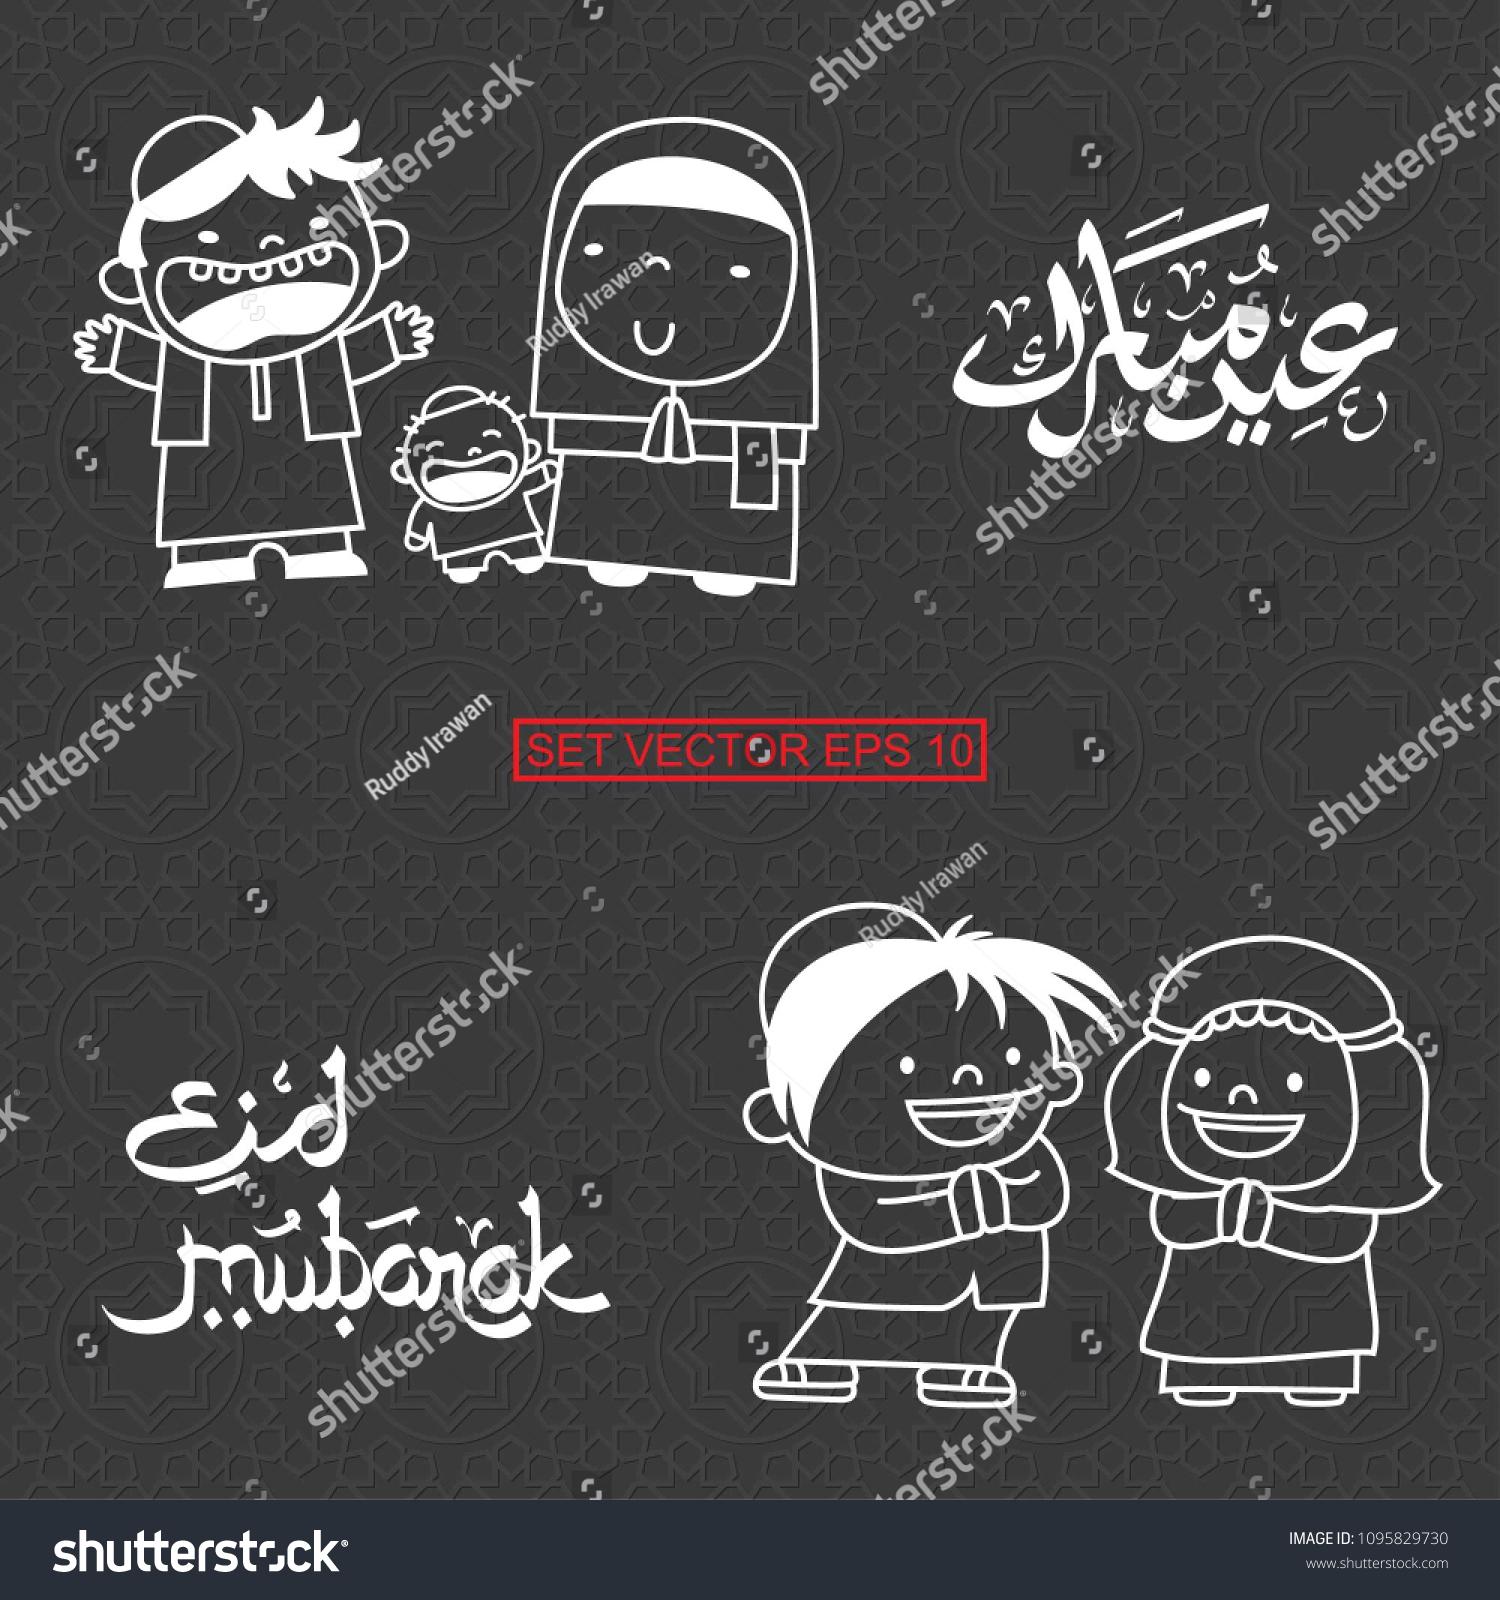 Mubarak Greeting Card Cartoon Illustration Calligraphy Stock Vector